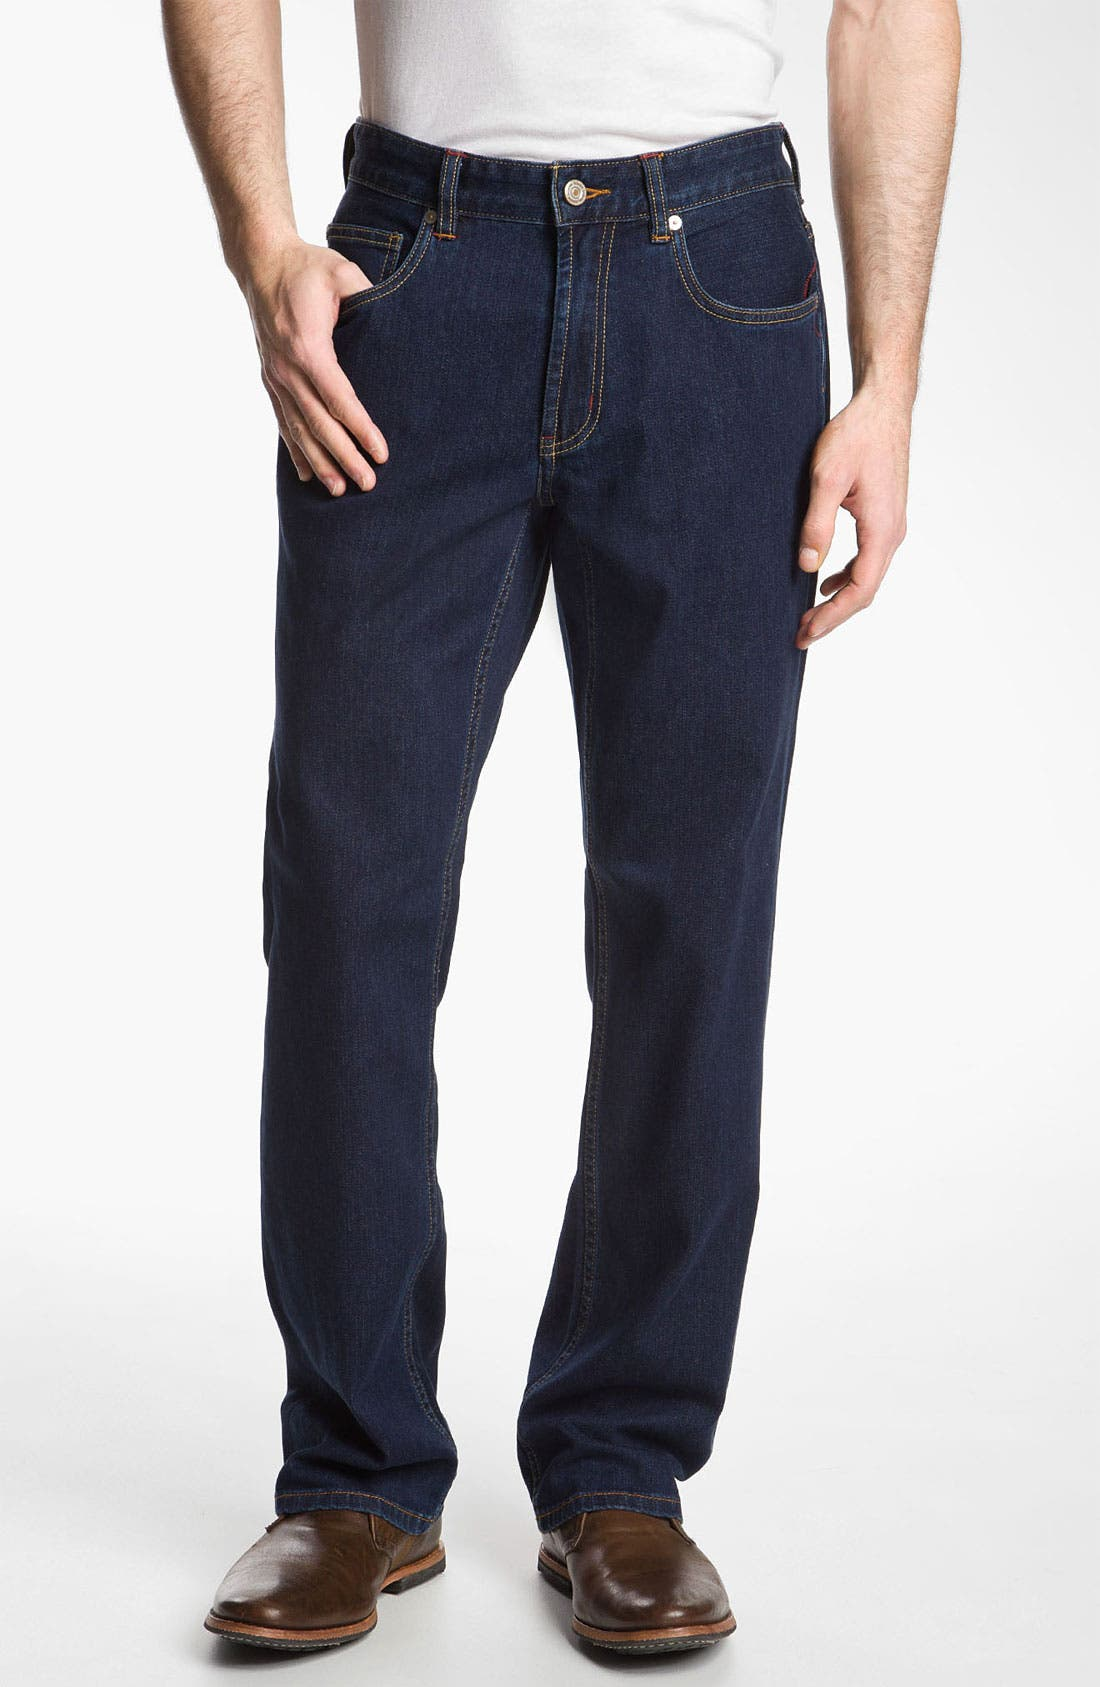 Main Image - Tommy Bahama Denim 'Original Cooper' Jeans (New Rinse)